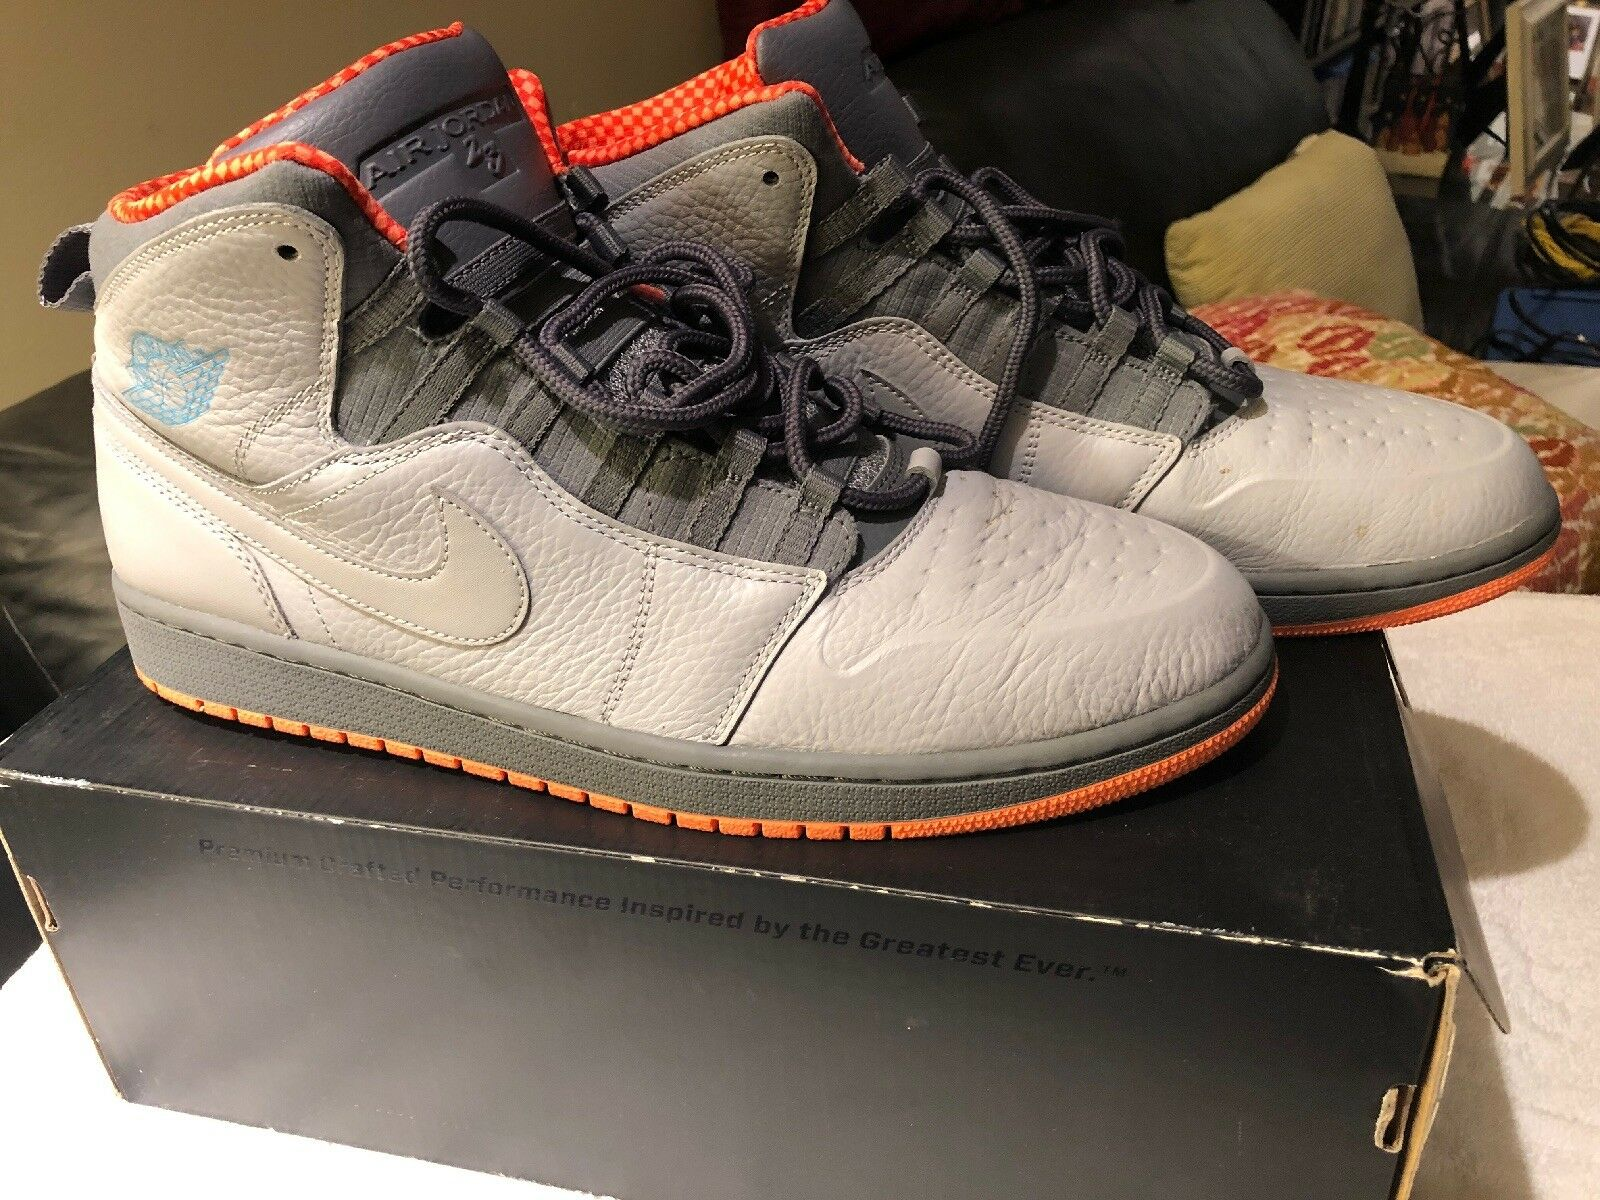 Nike Nike Nike Air Jordan 1 Retro 94 Bobcats Grey   orange 631733-032 Sz 13 0a37db